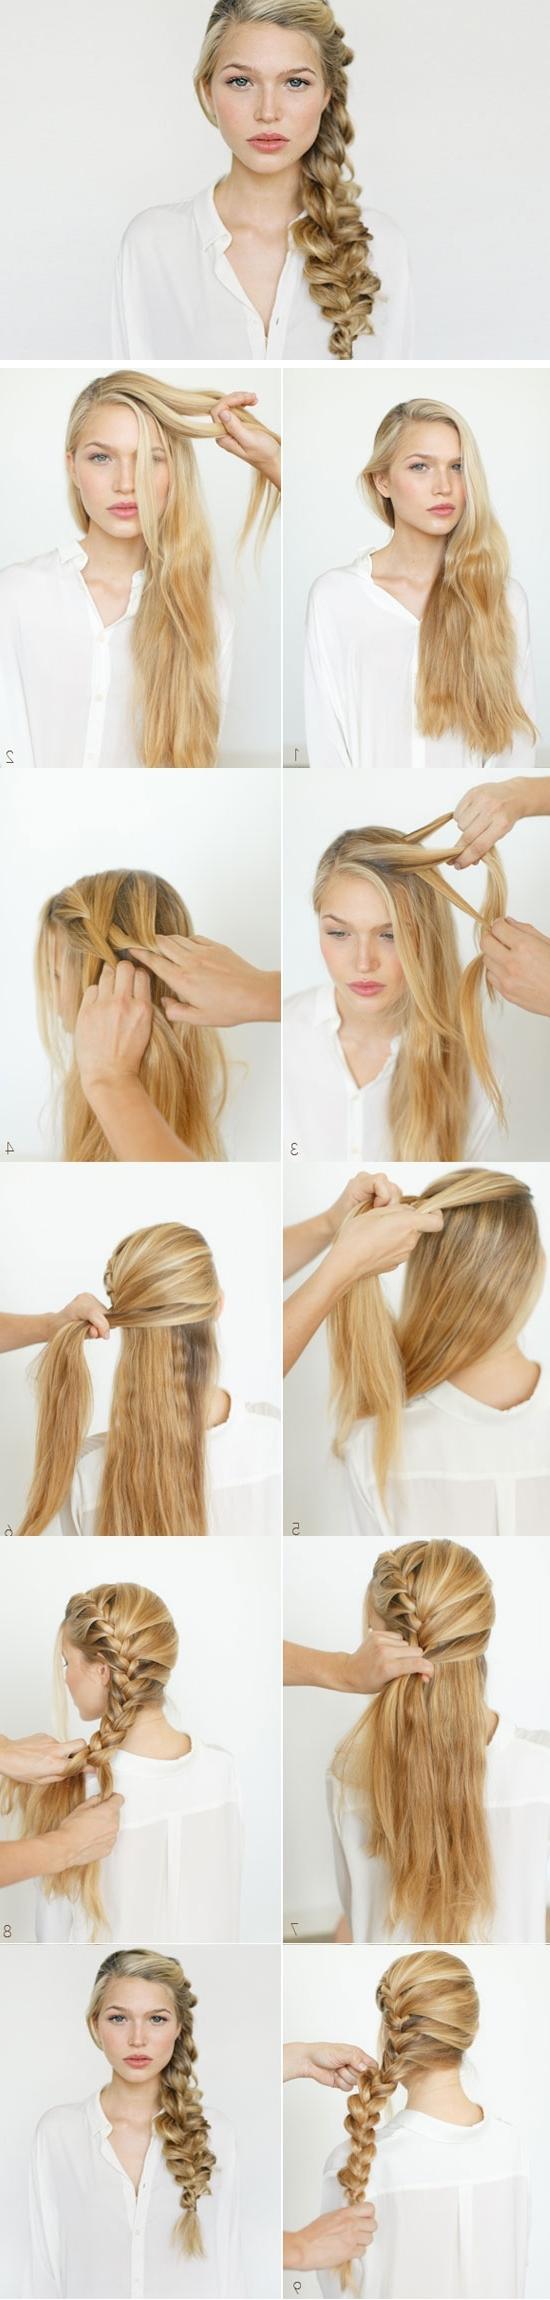 Easy Diy Wedding Hairstyles For Long Hair Inside Well Known Wedding Easy Hairstyles For Medium Hair (Gallery 15 of 15)